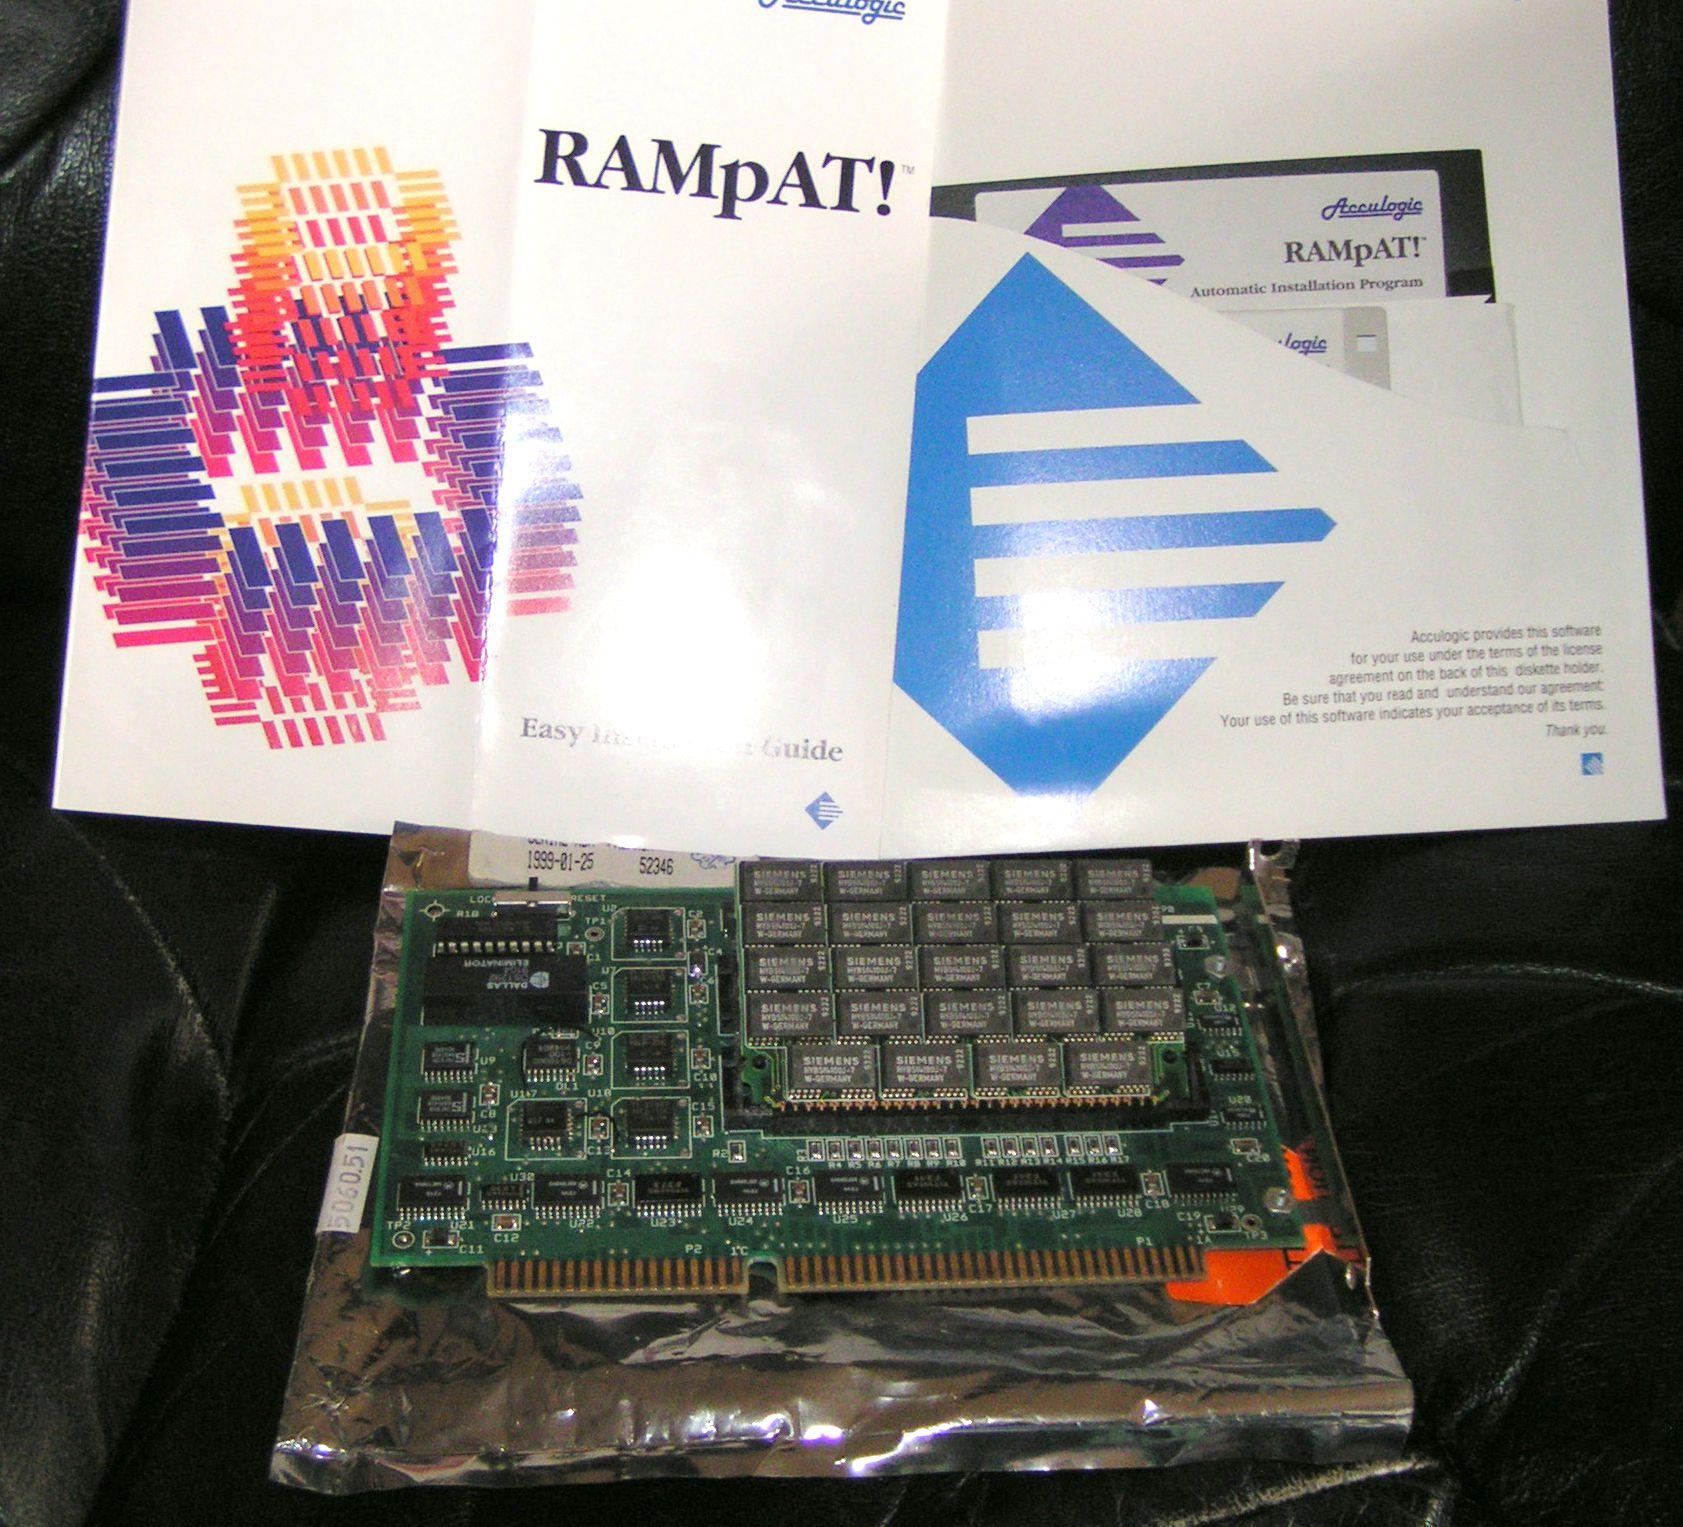 RAMpAT! & accessories